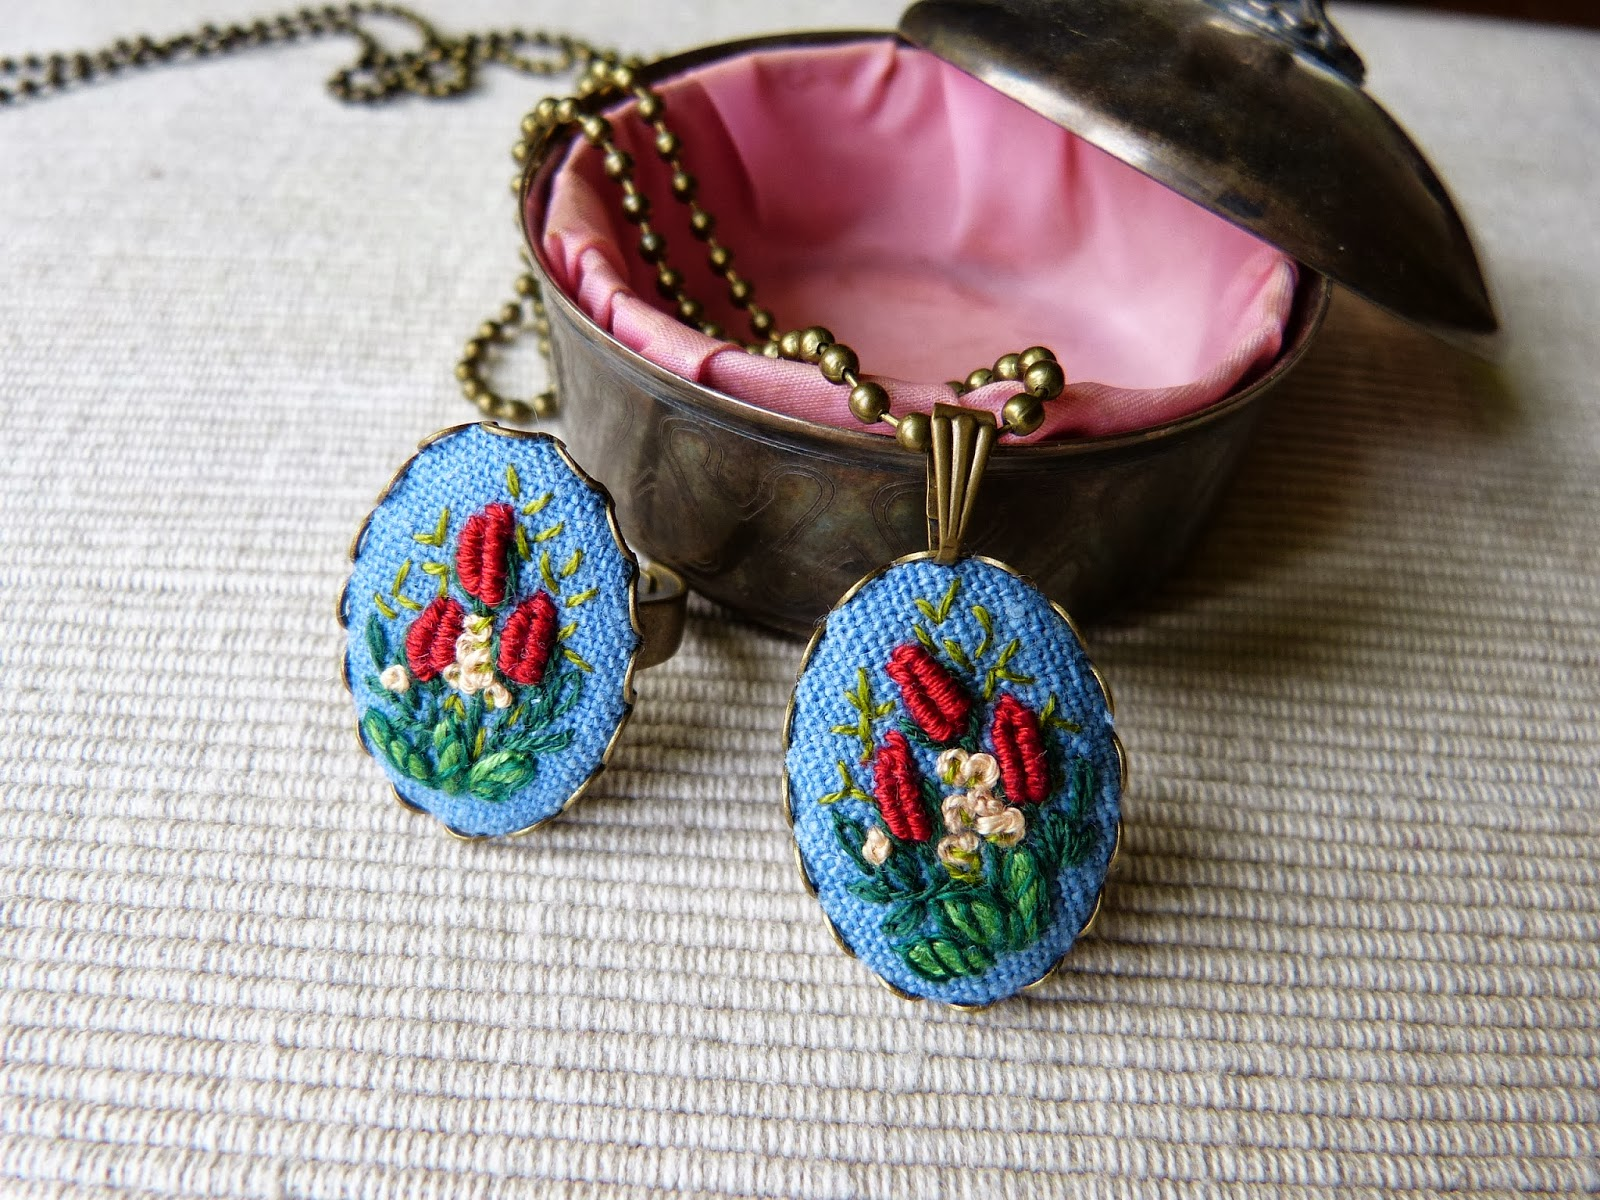 haft rococo, embroidered pendant, haftowane róże, haftowany naszyjnik, naszyjnik z haftem, embroidered jewerly, naszyjnik vintage, medalion z haftem, handmade jewerly, pierścionek z haftem